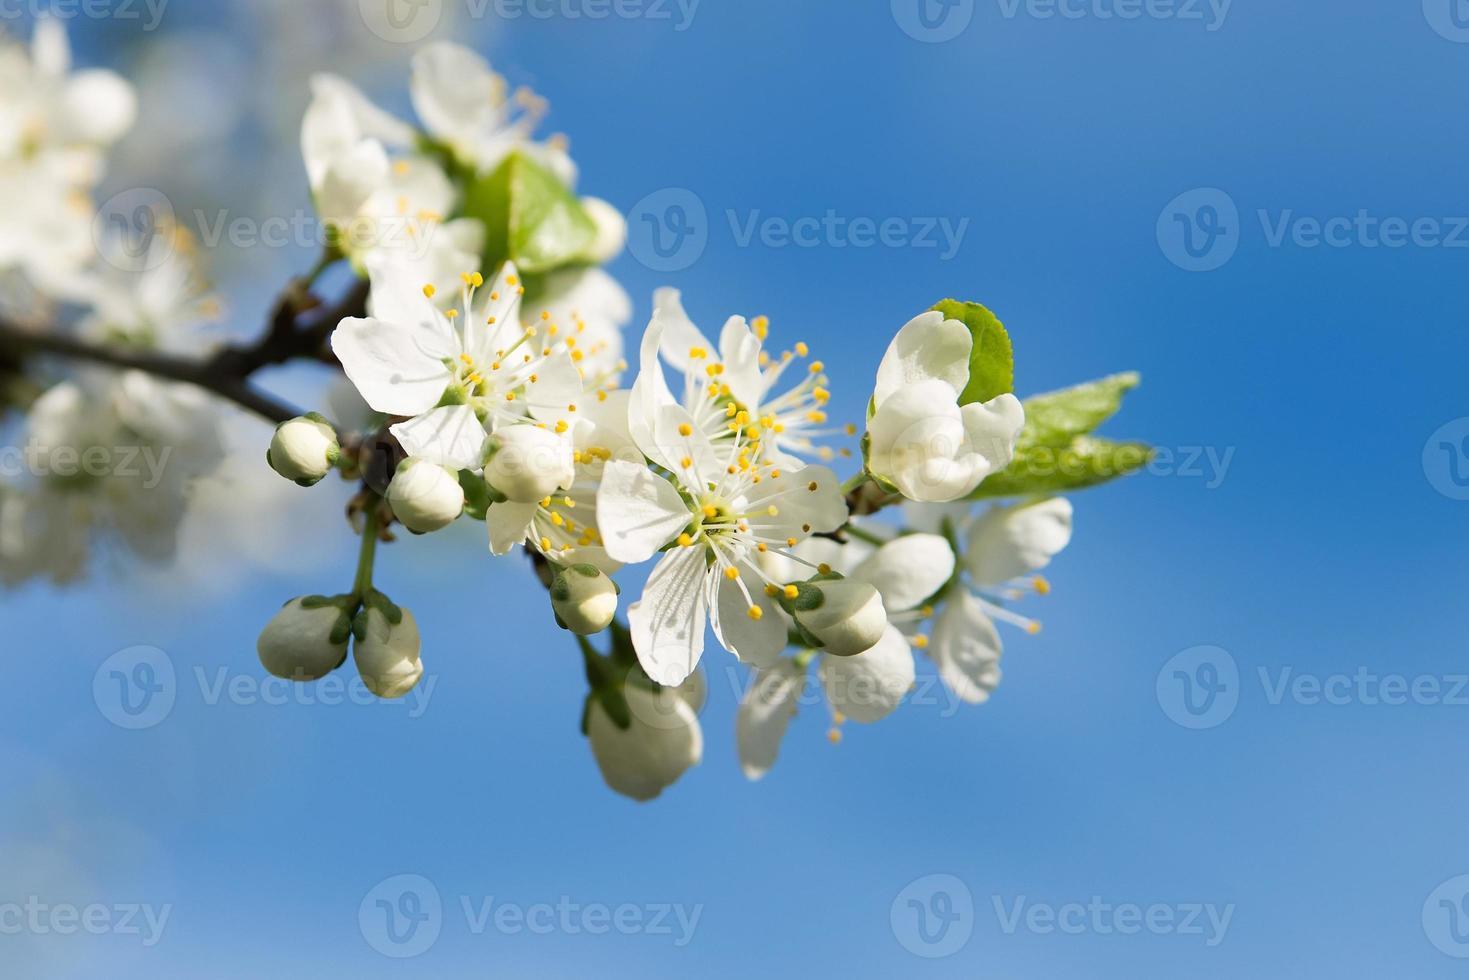 appelboom bloesem. zonnige dag. blauwe lucht foto